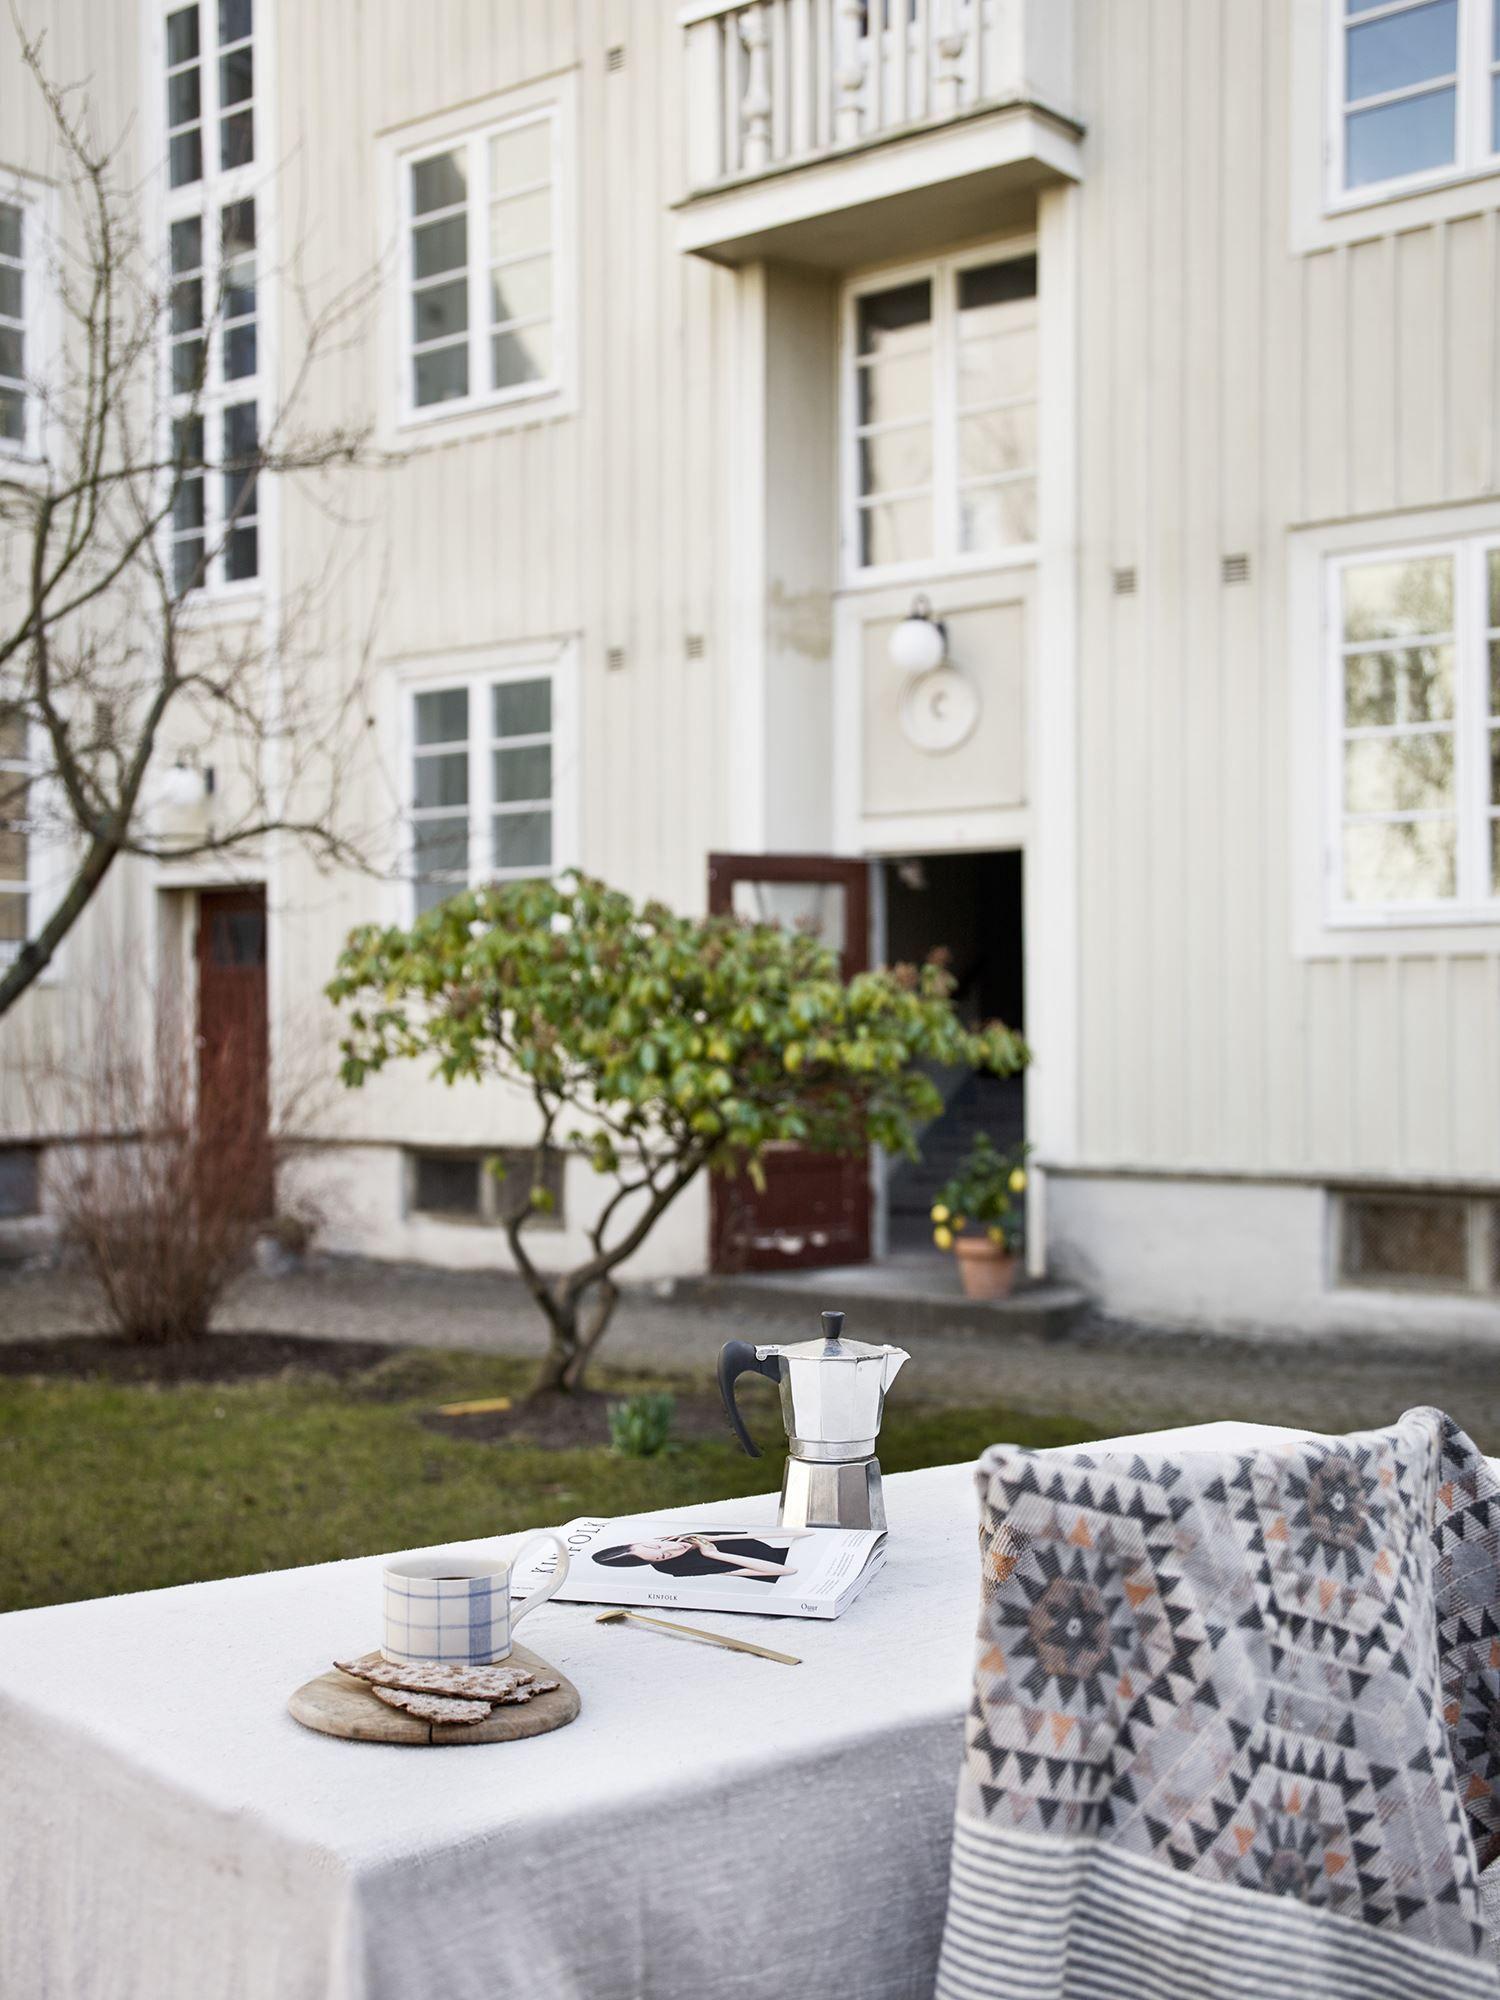 Styling Joanna Bagge. Photo Krister Engström I Kvarteret mäkleri, Göteborg